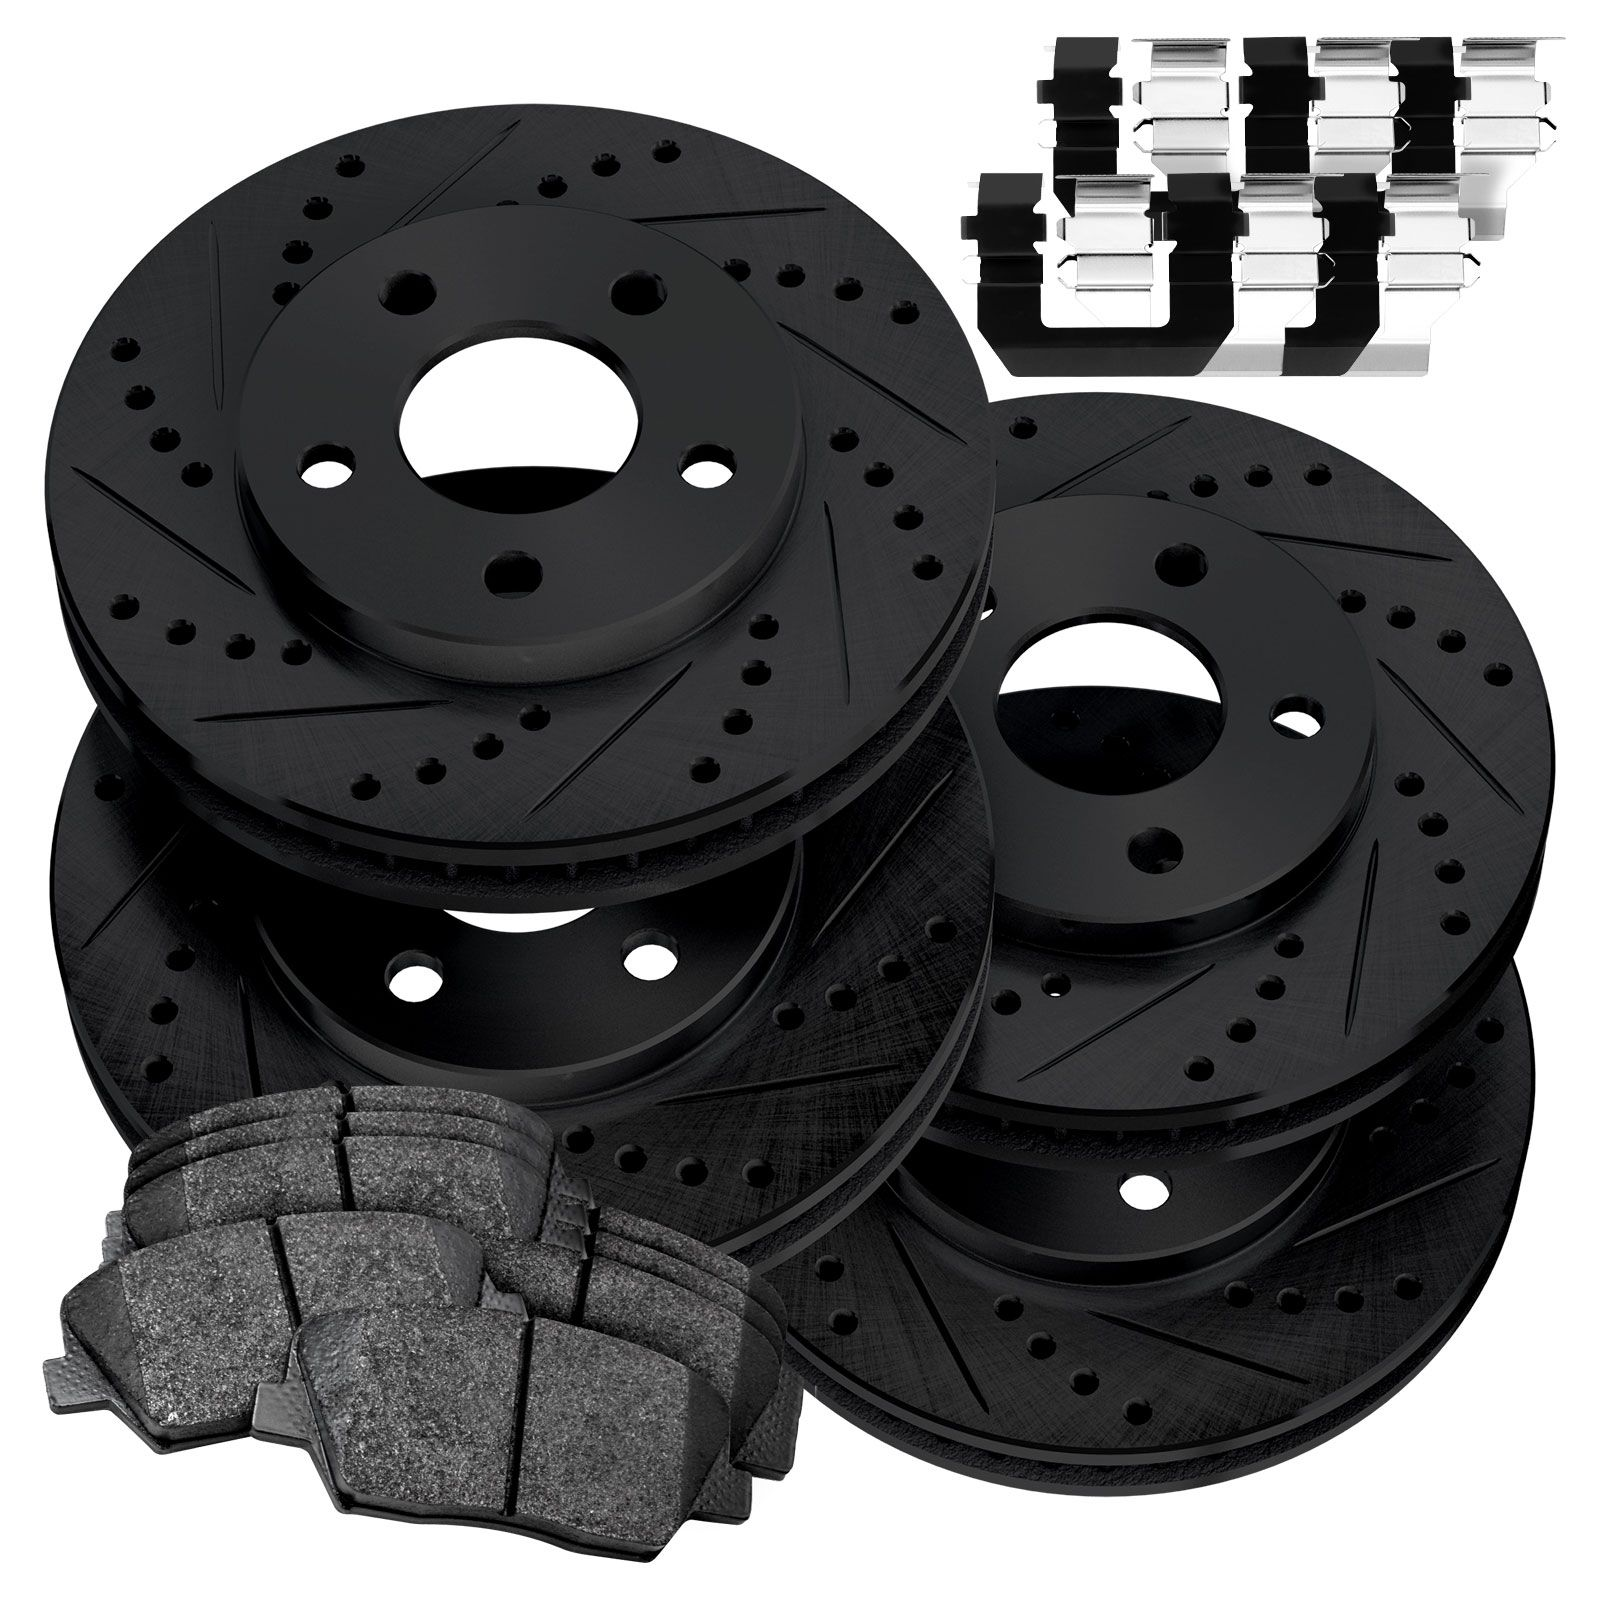 Fit 2014-2015 Jeep Cherokee Front Black Drill Slot Brake Rotors+Ceramic Pads